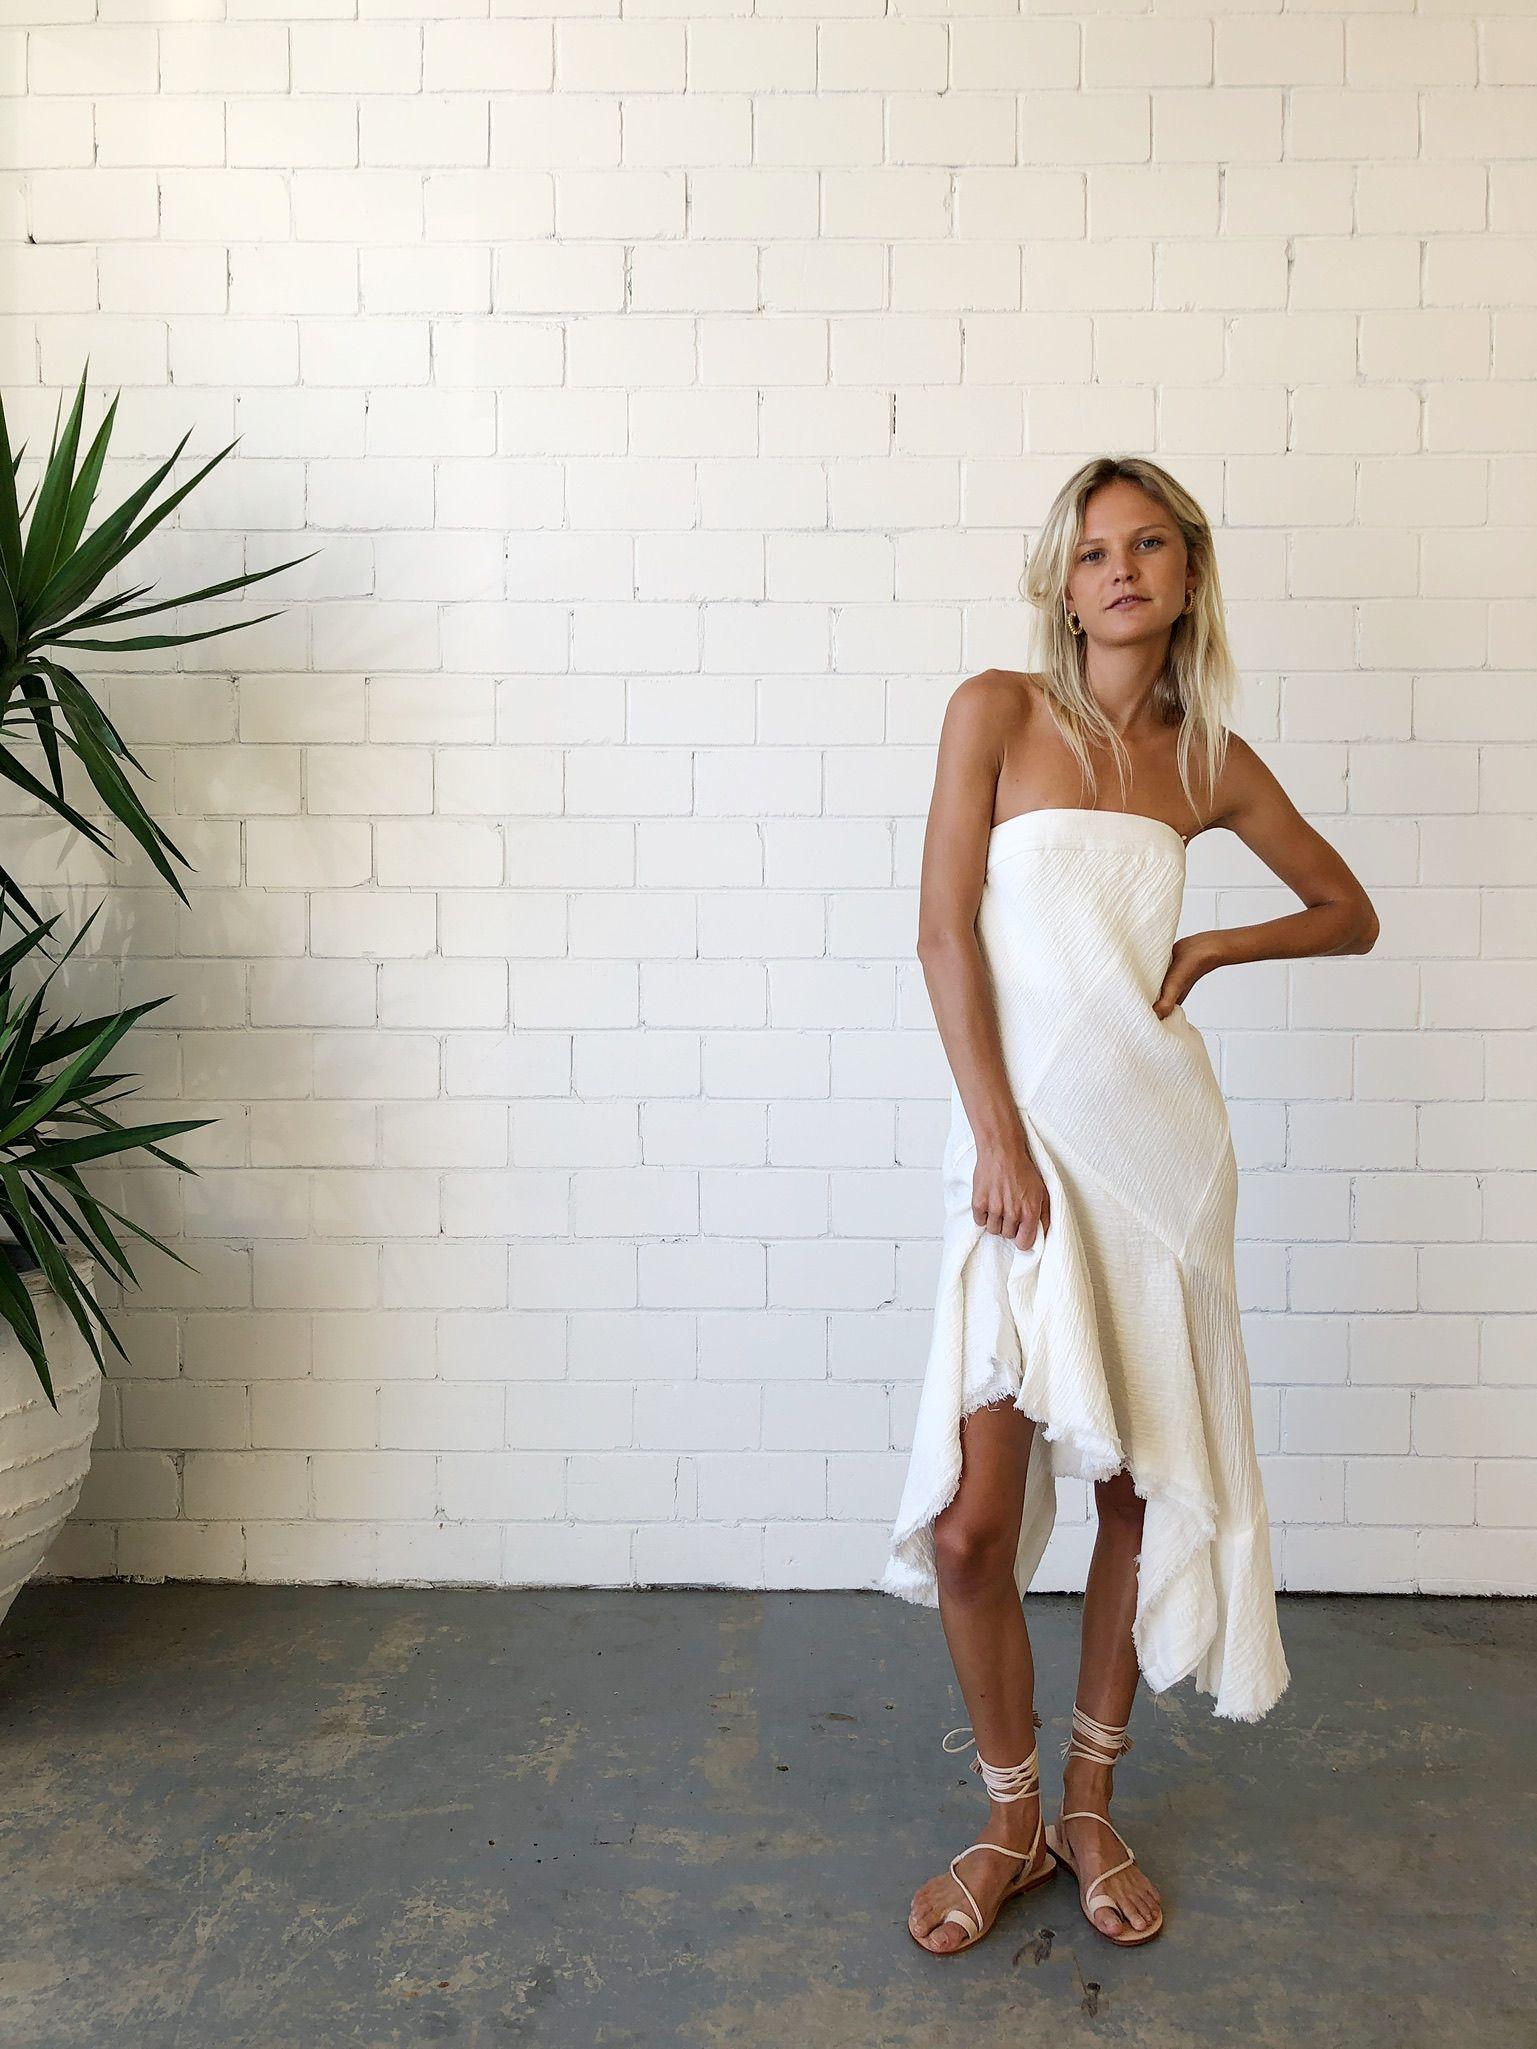 KitX Faithful Keeper Strapless Dress - White